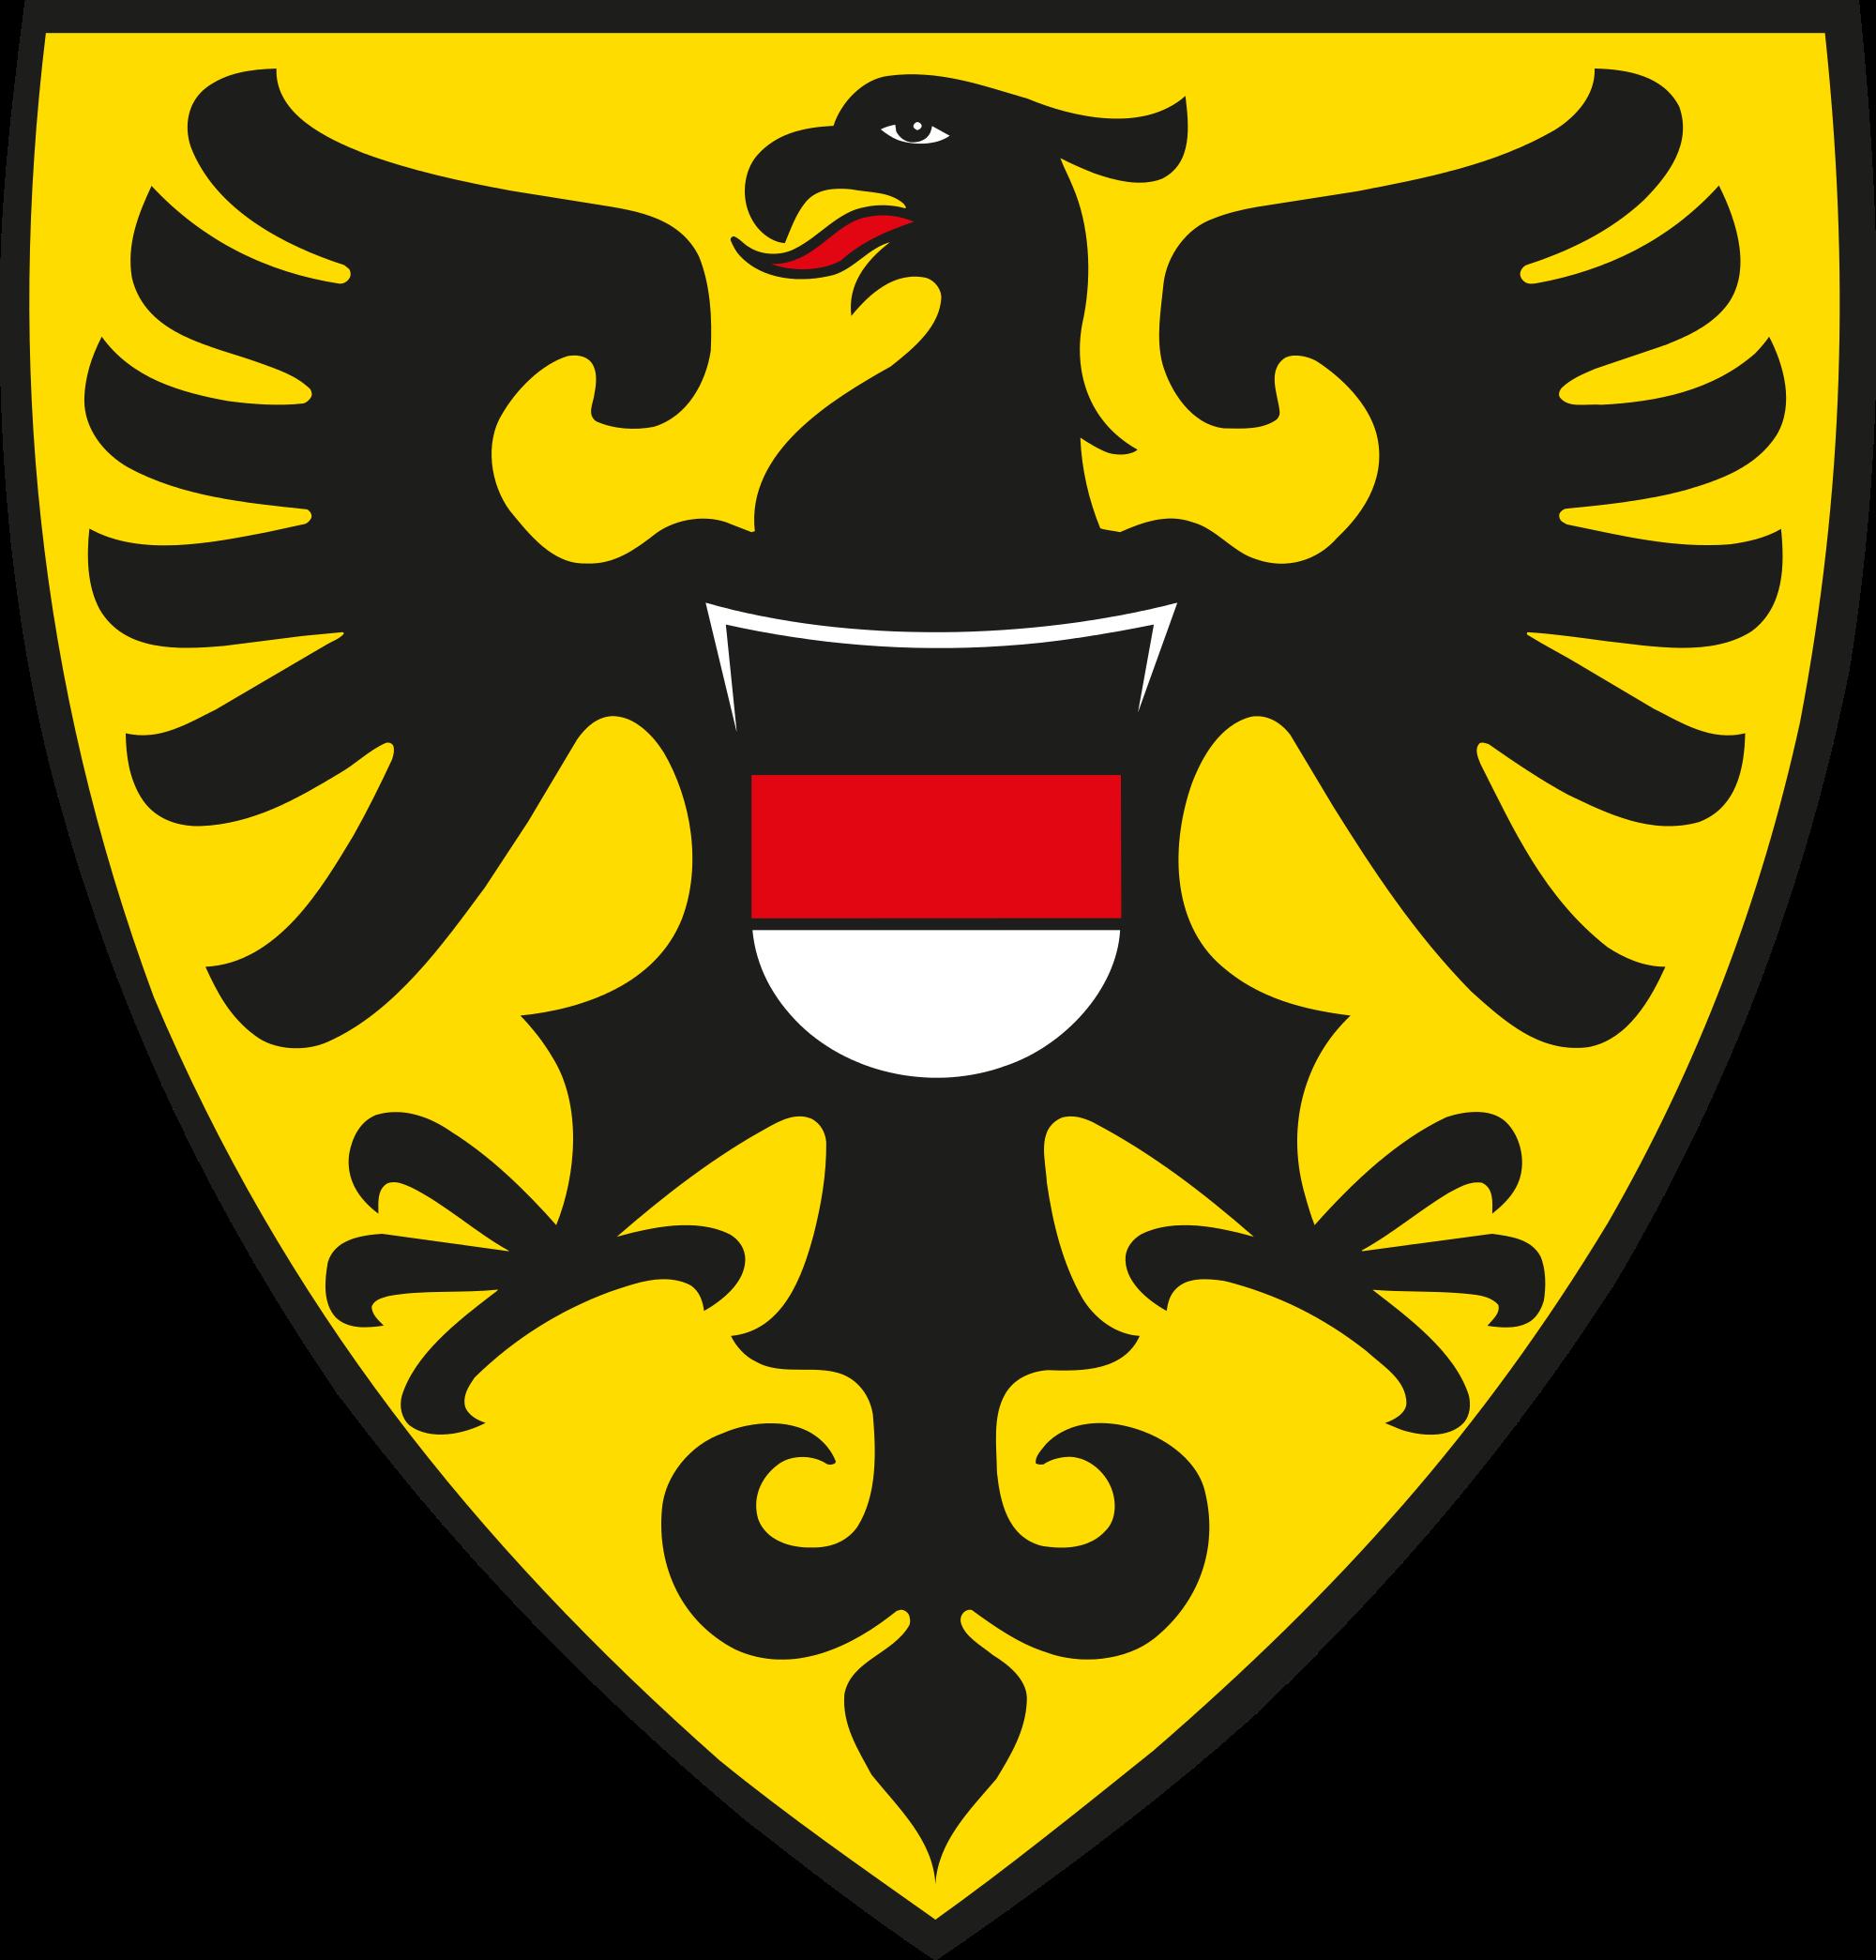 File:Wappen Stadt Reutlingen.svg.